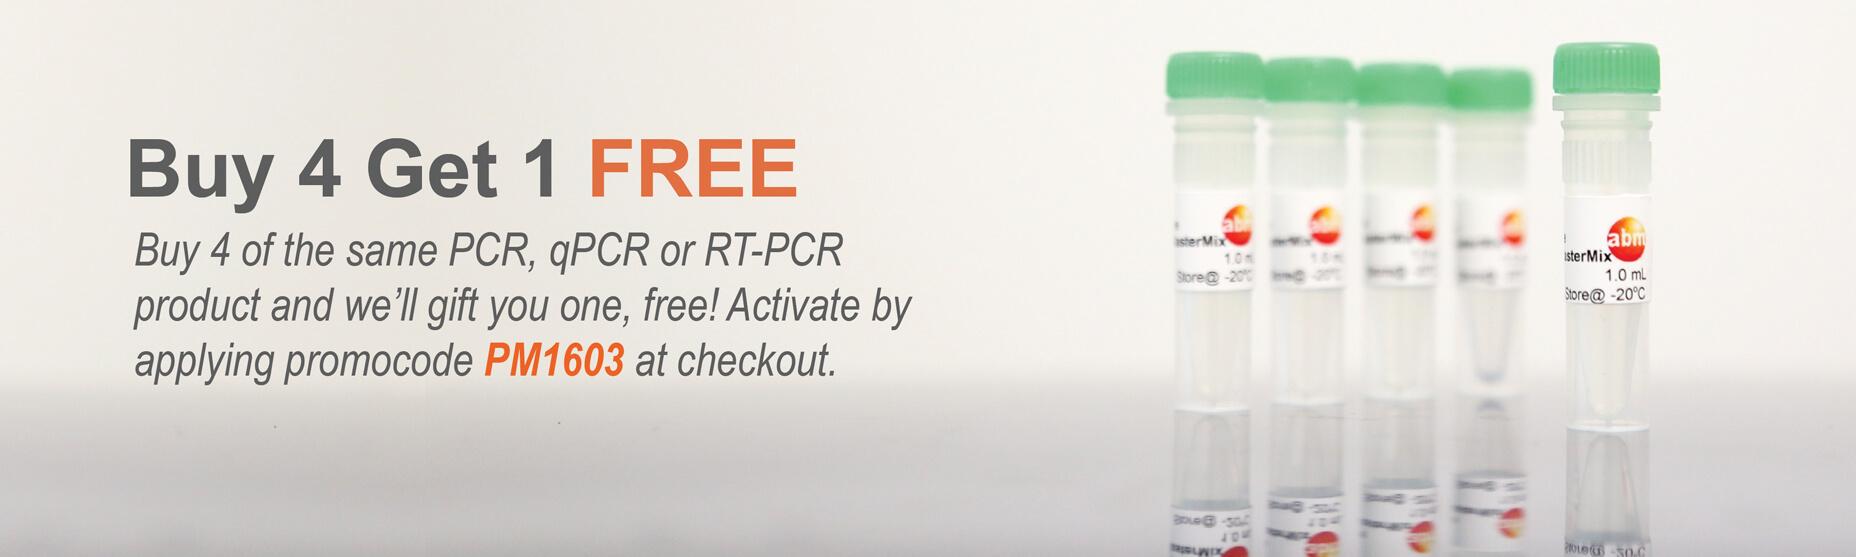 PCR-Buy-4-Get-1-Free-Promotion-Banner-01